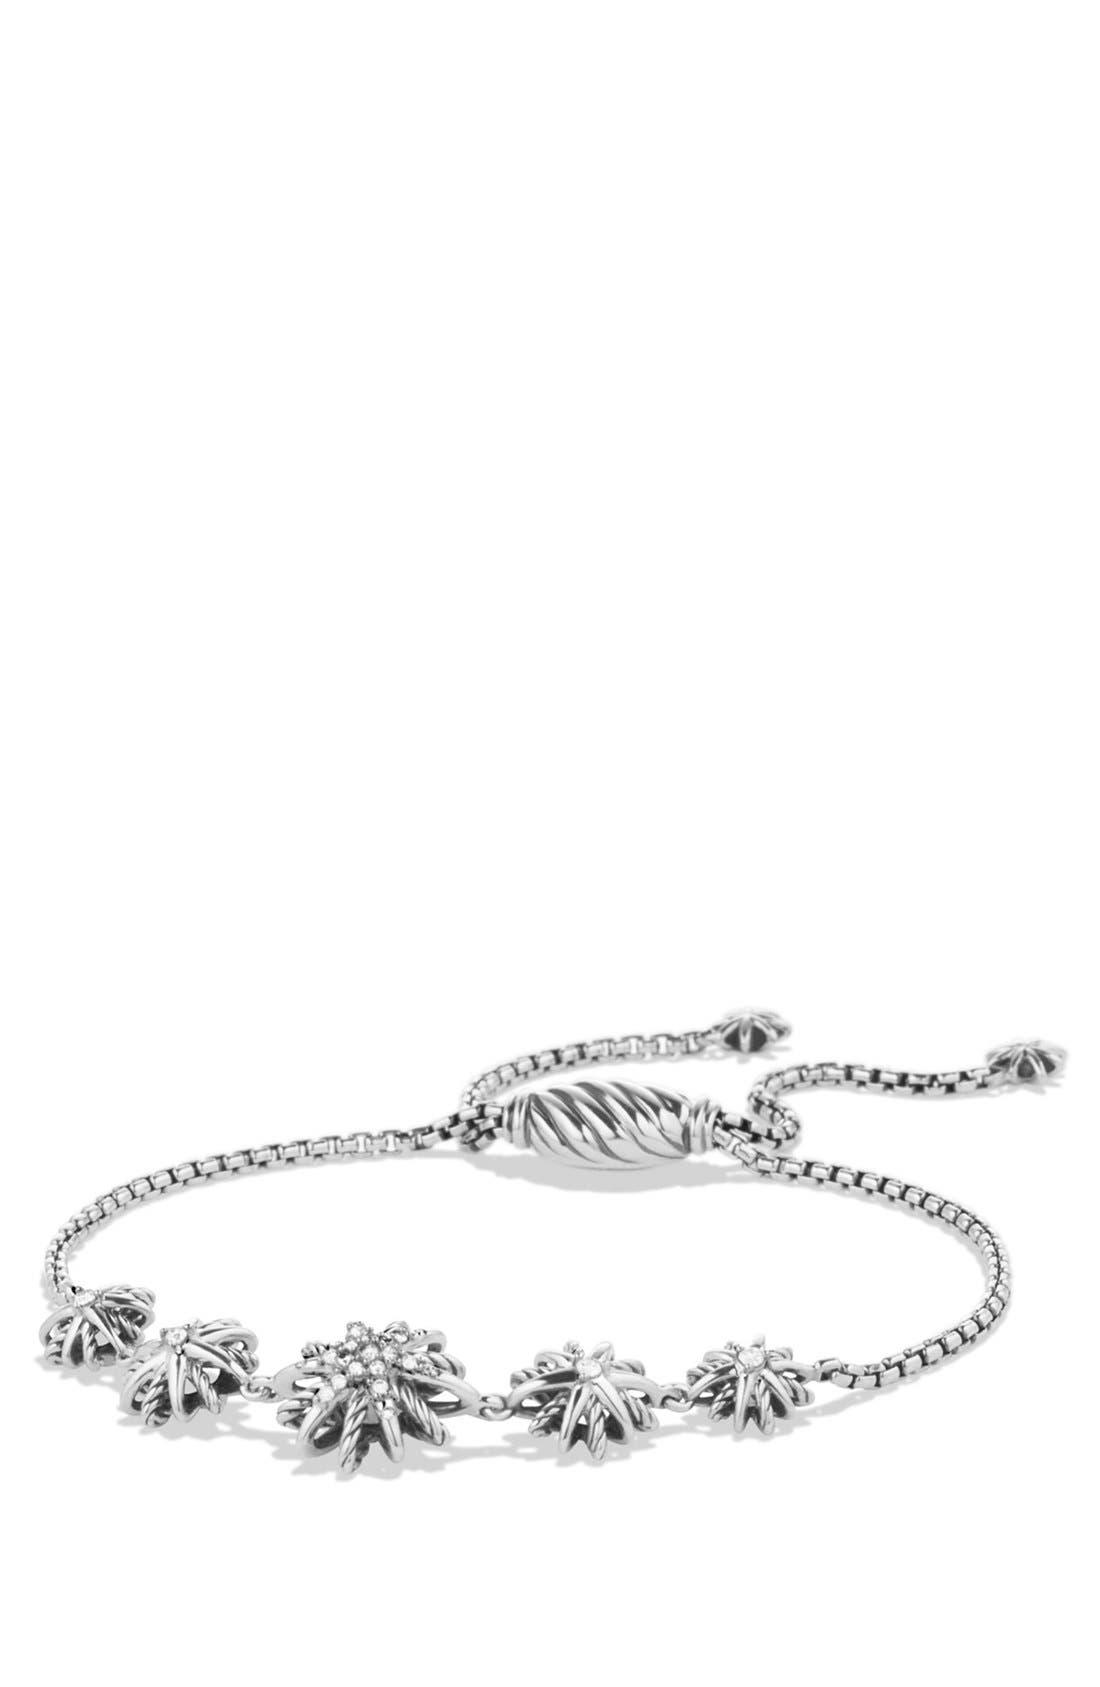 DAVID YURMAN 'Starburst' Five-Station Bracelet with Diamonds, Main, color, DIAMOND